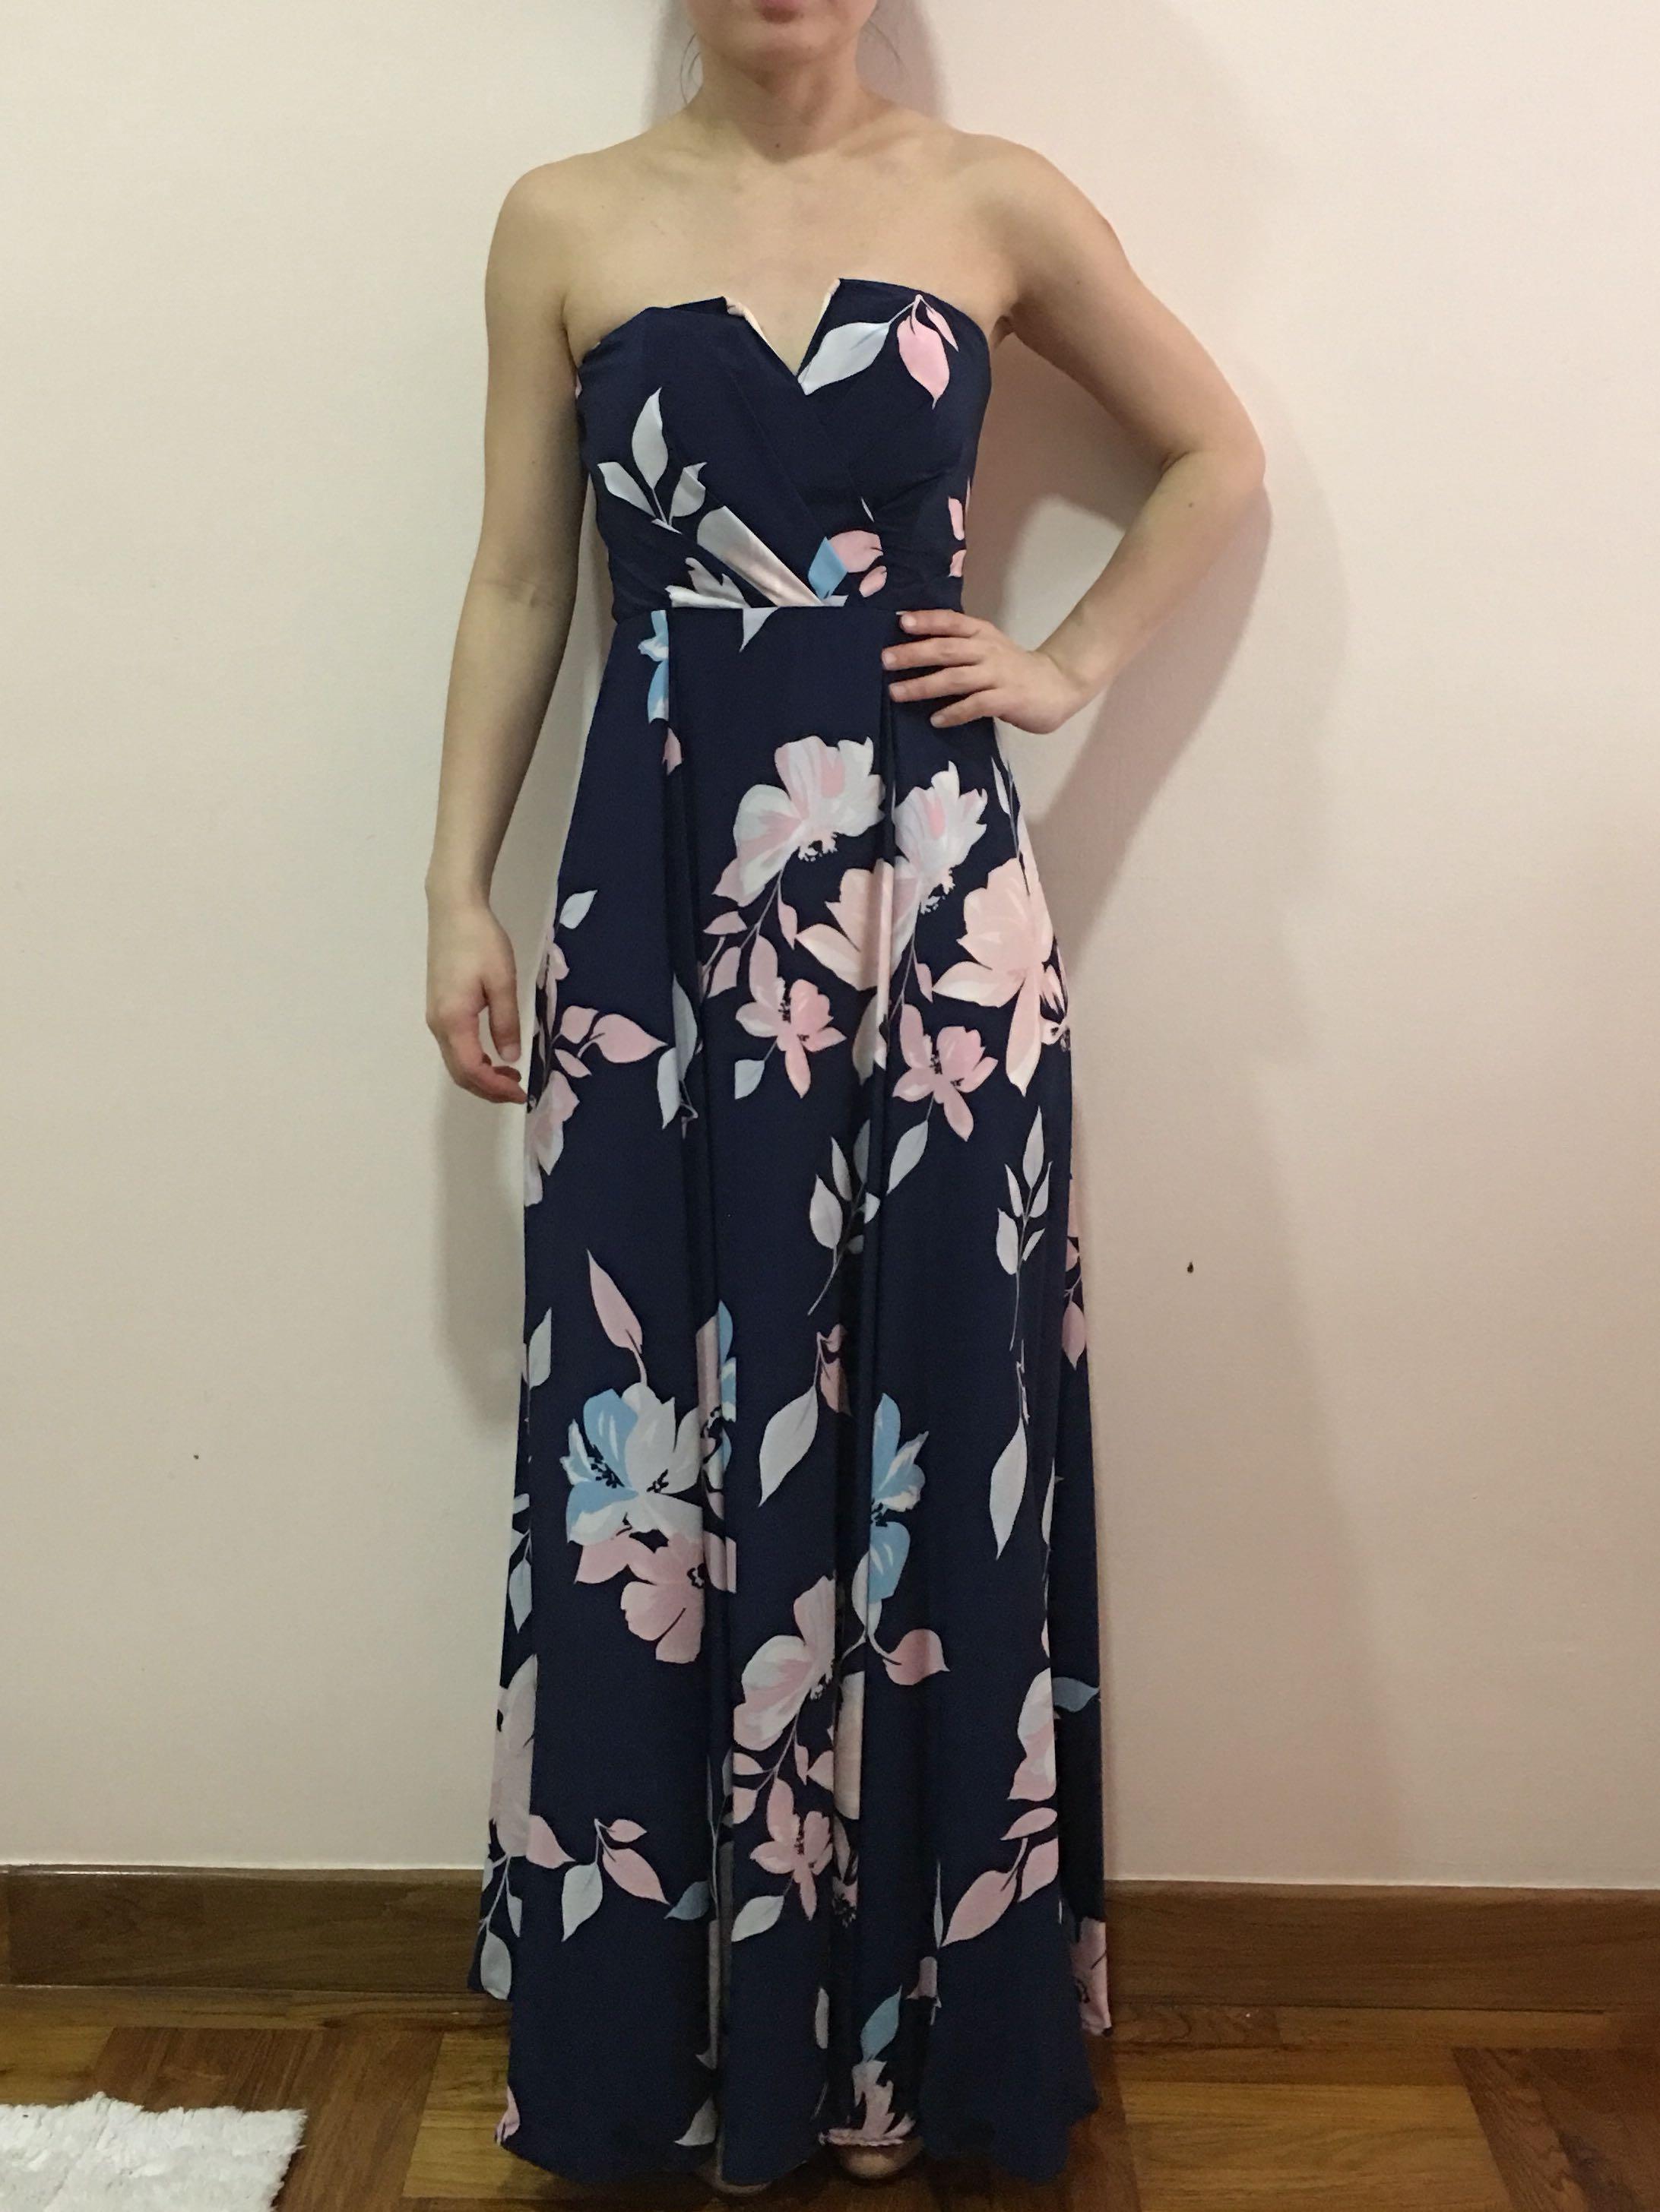 6a4a6159b74e Yumi Kim Mischief Silk Maxi Dress, Women's Fashion, Clothes, Dresses &  Skirts on Carousell